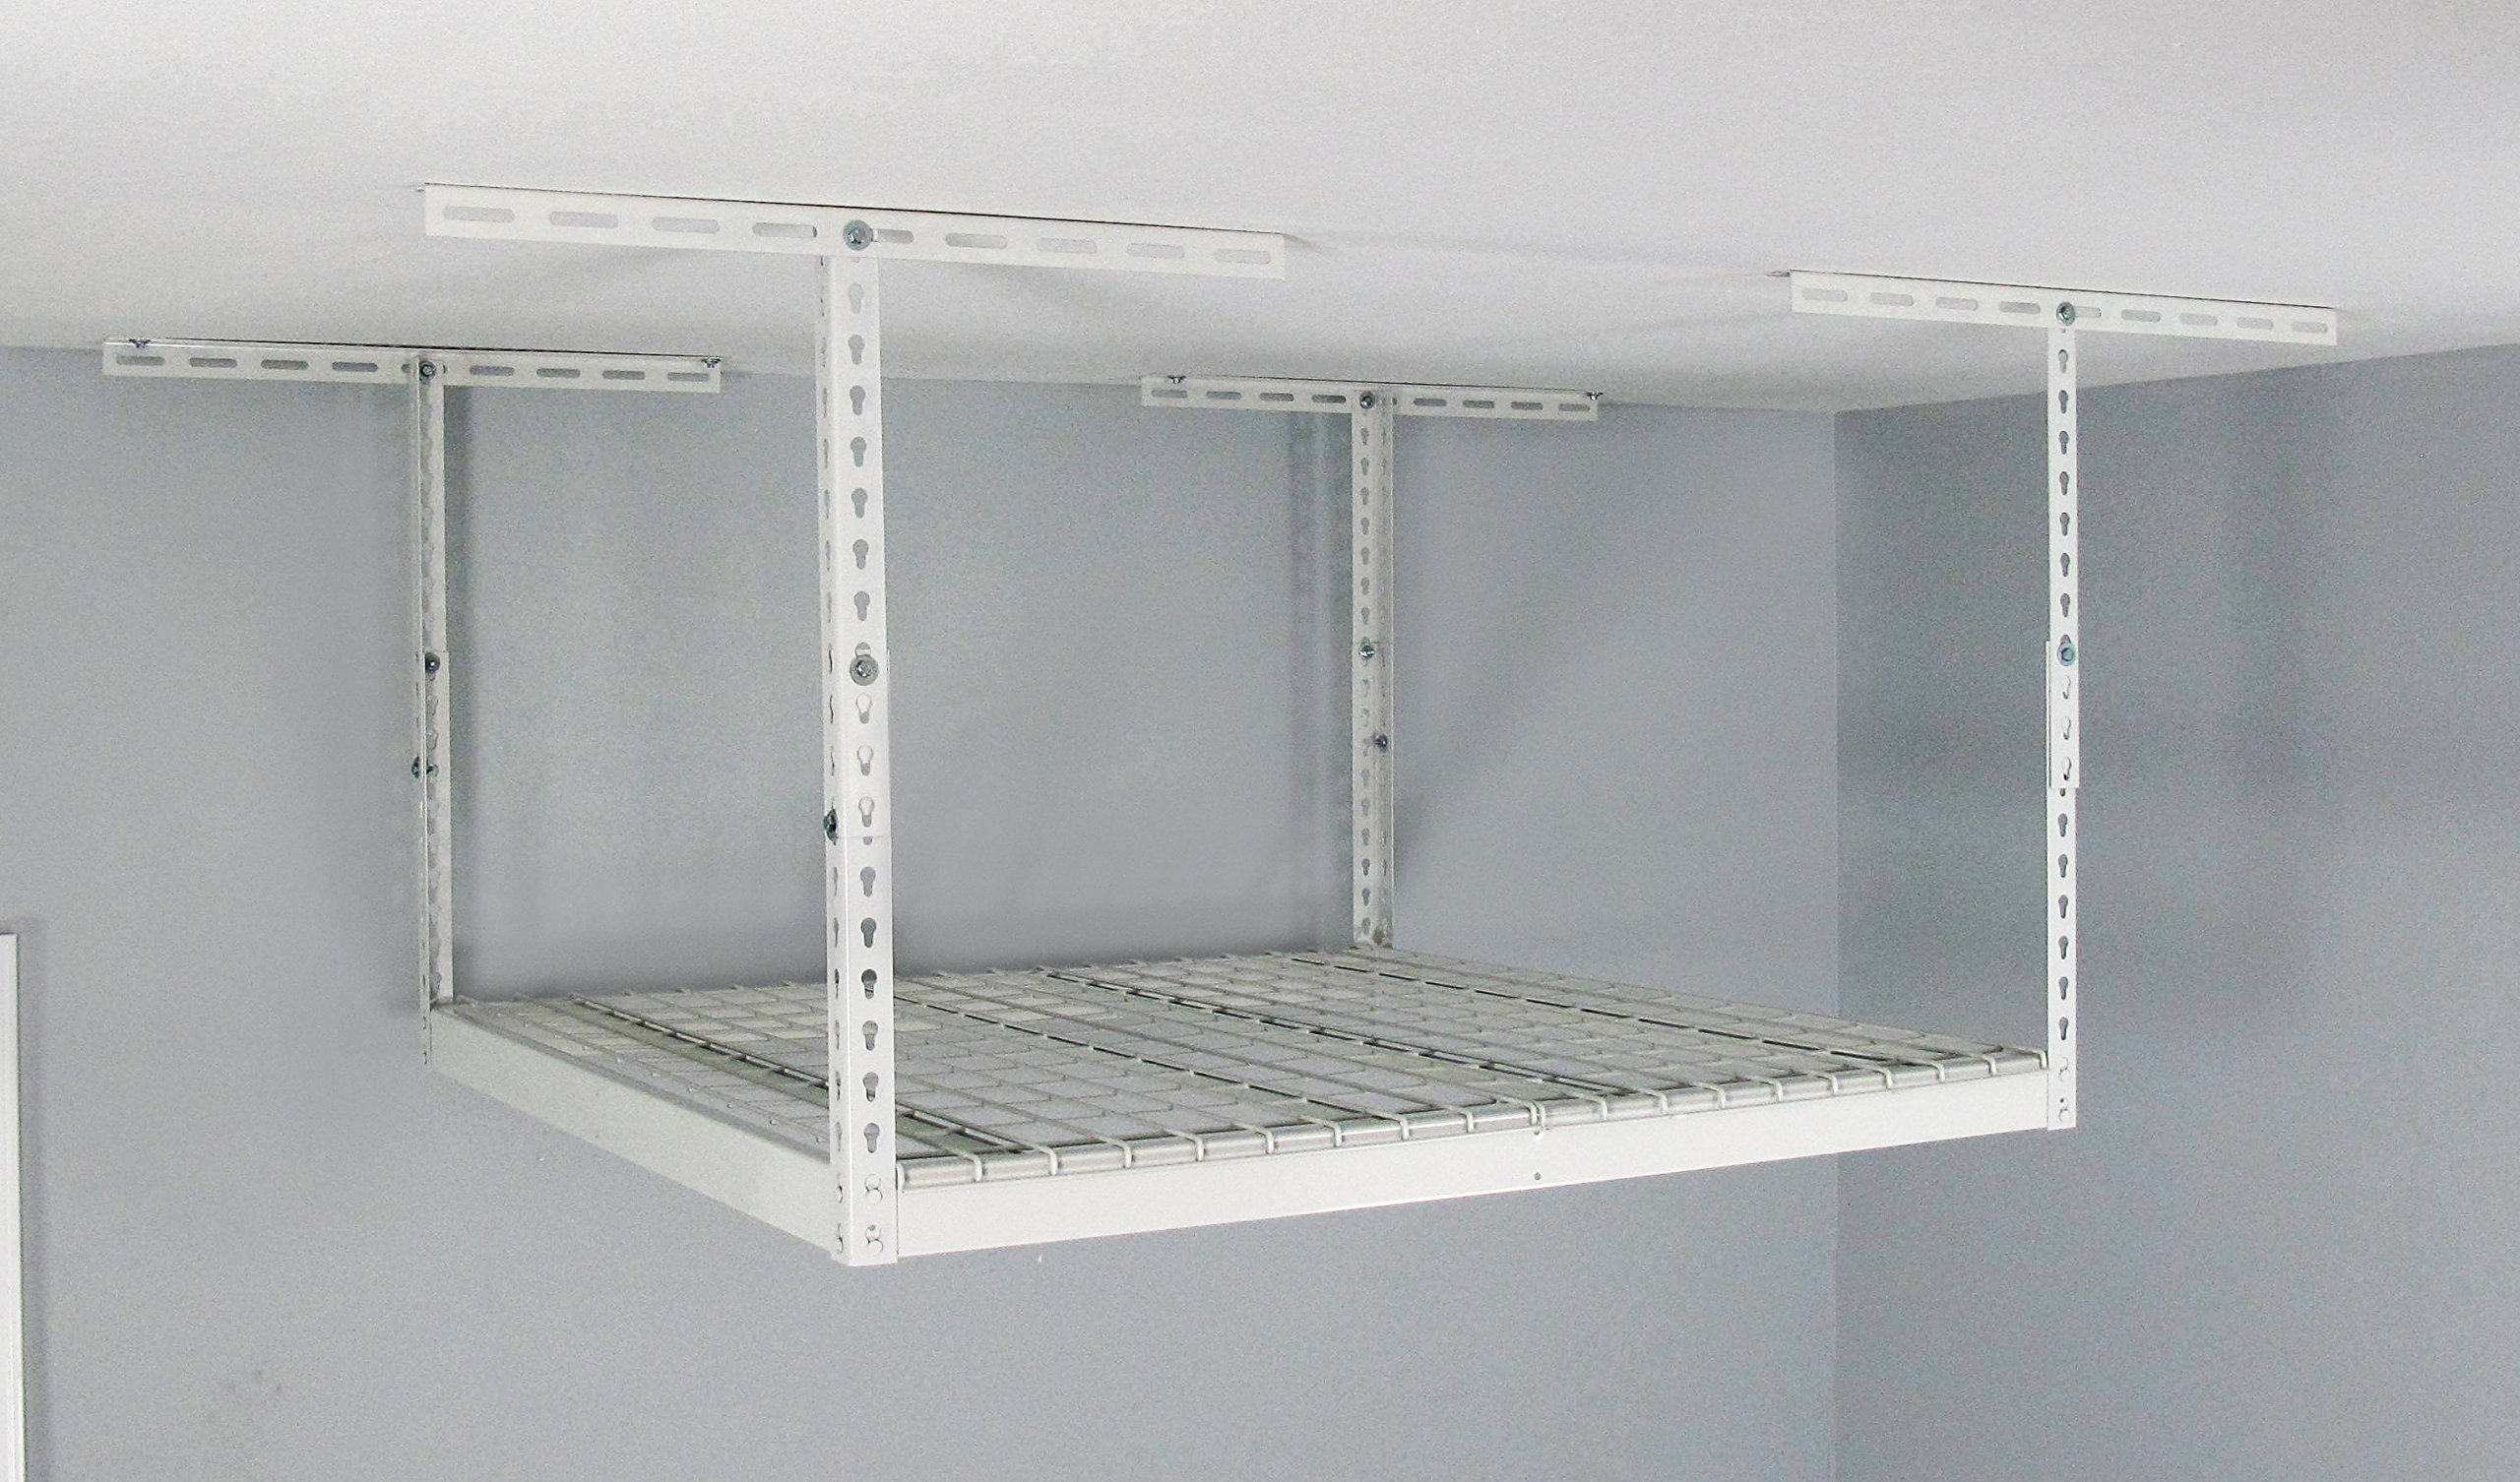 MonsterRax Overhead Garage Storage Rack (18'' to 33'' Ceiling Drop), 4' x 4', White